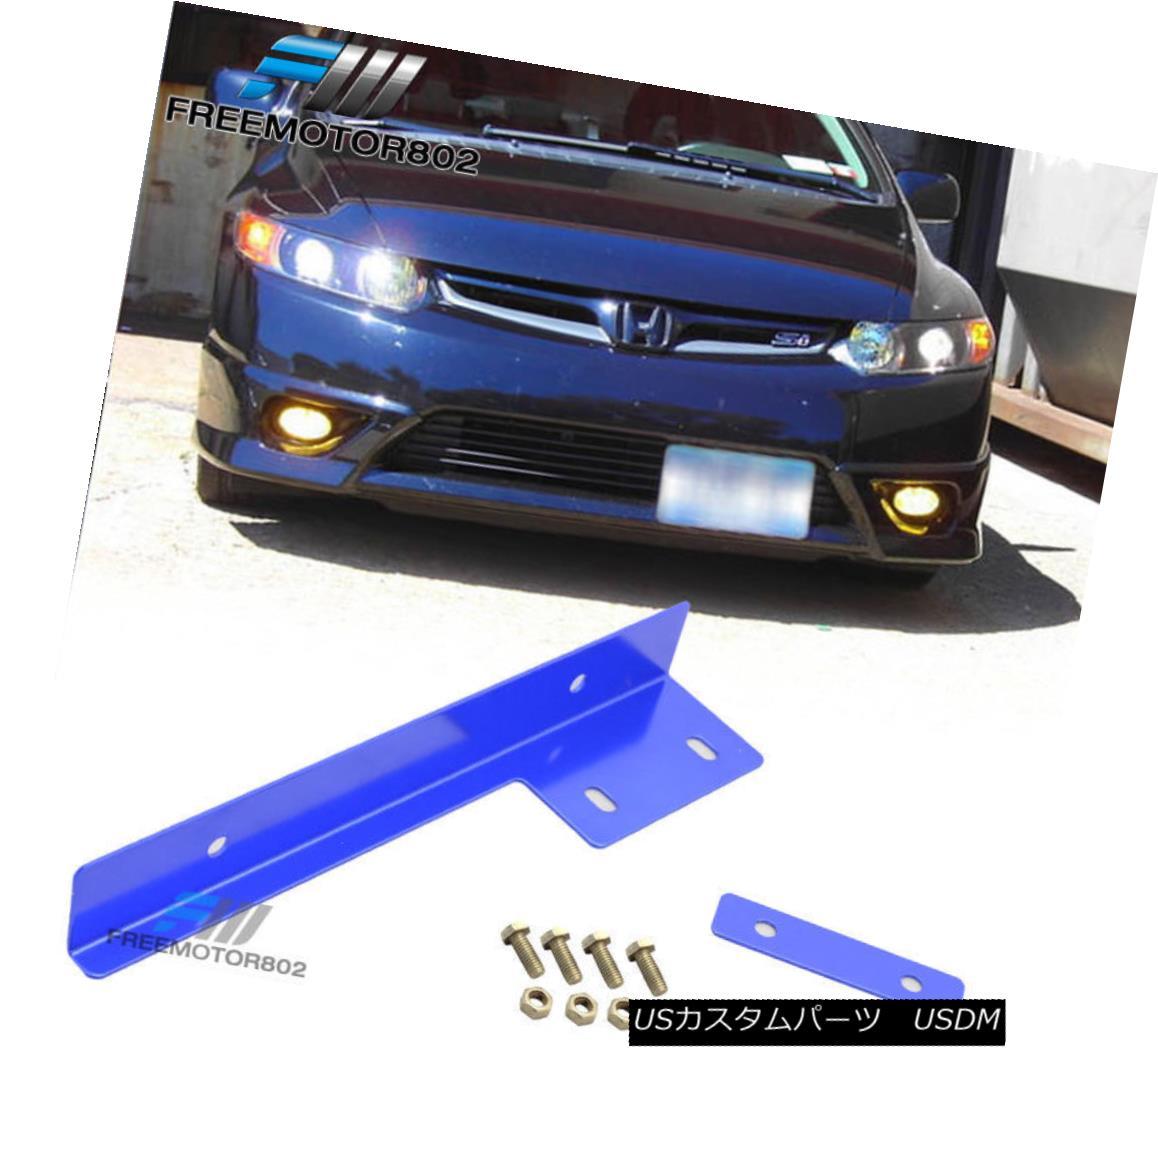 JDM Black Universal Front Bumper License Plate Relocator Bracket Holder Bar Kit